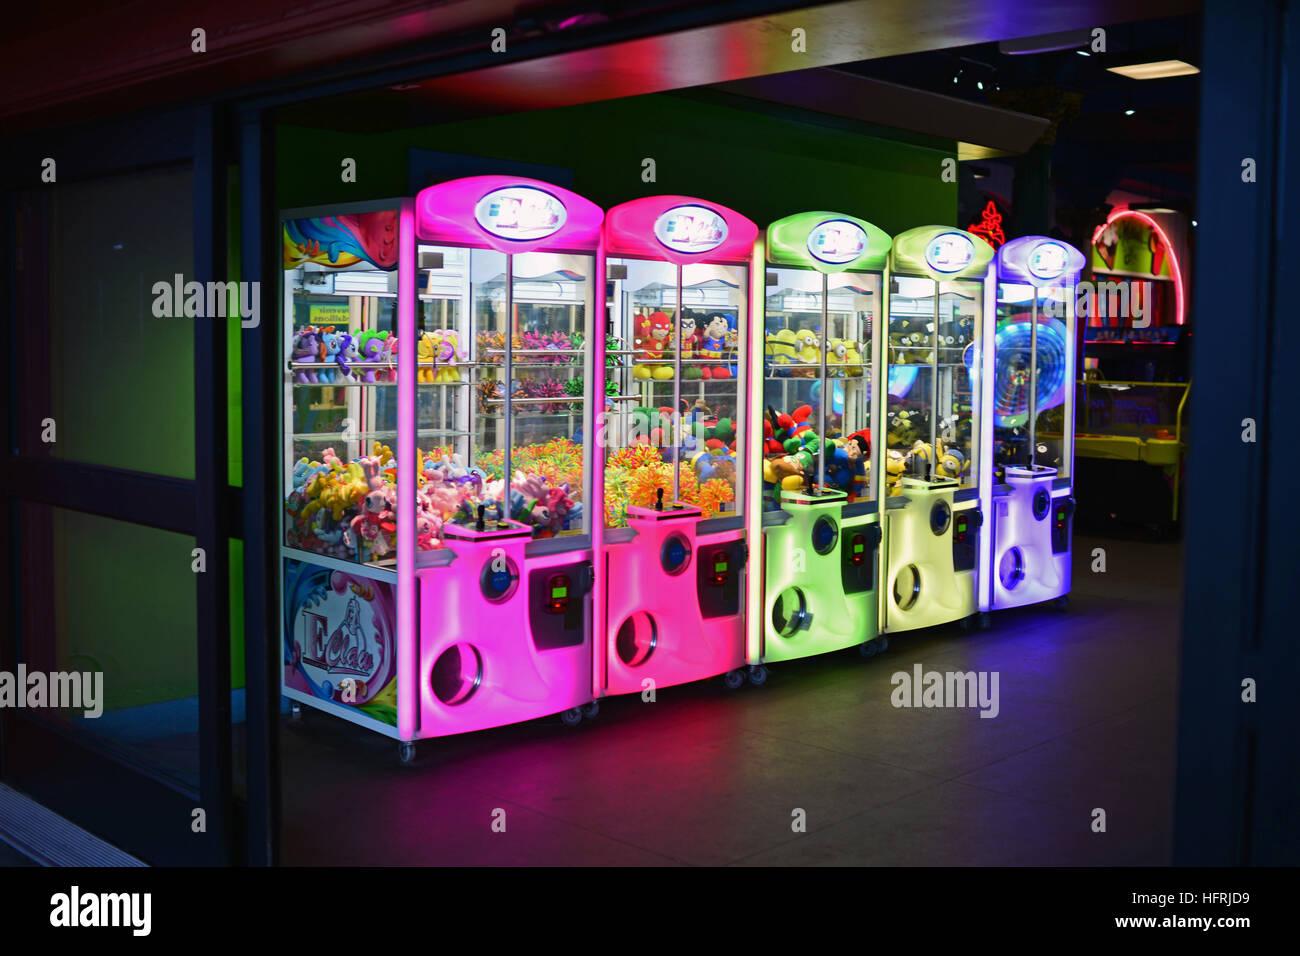 Claw machines in different neon colours, Santa Cruz, California. - Stock Image